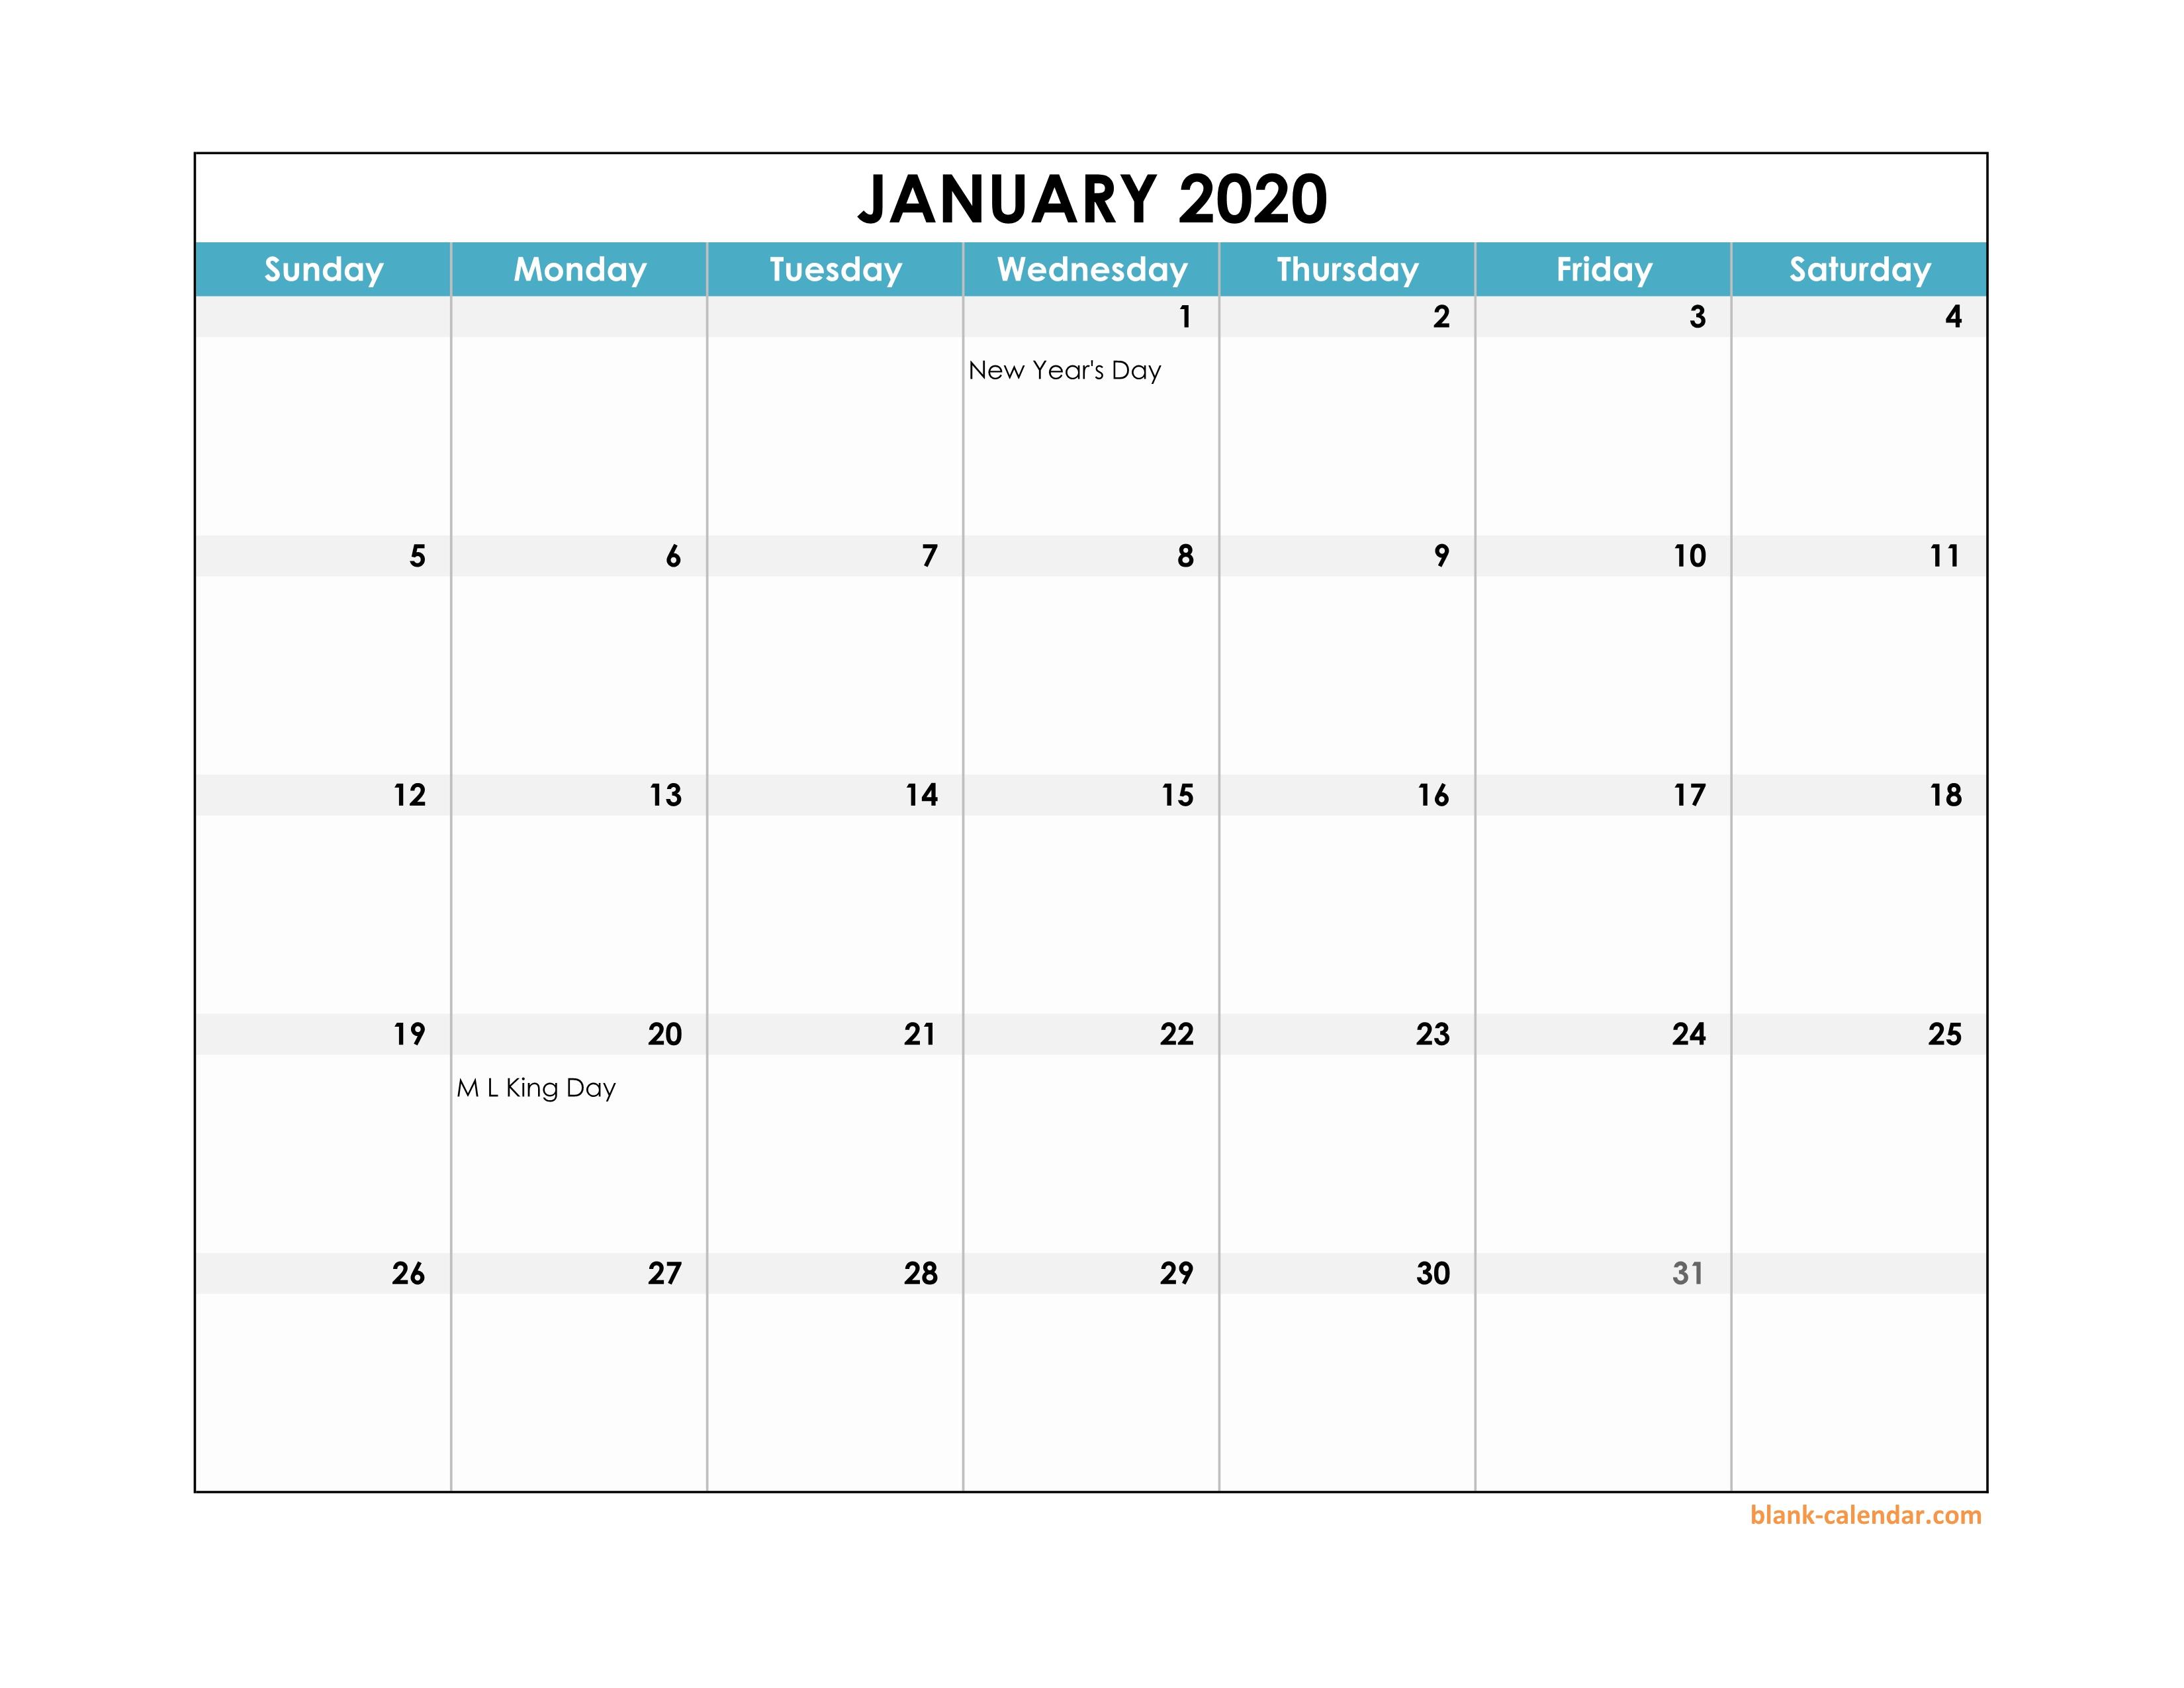 Calendar 2020 With Holidays Excel  Bolan.horizonconsulting.co inside 2020 Calendar Hk Excel